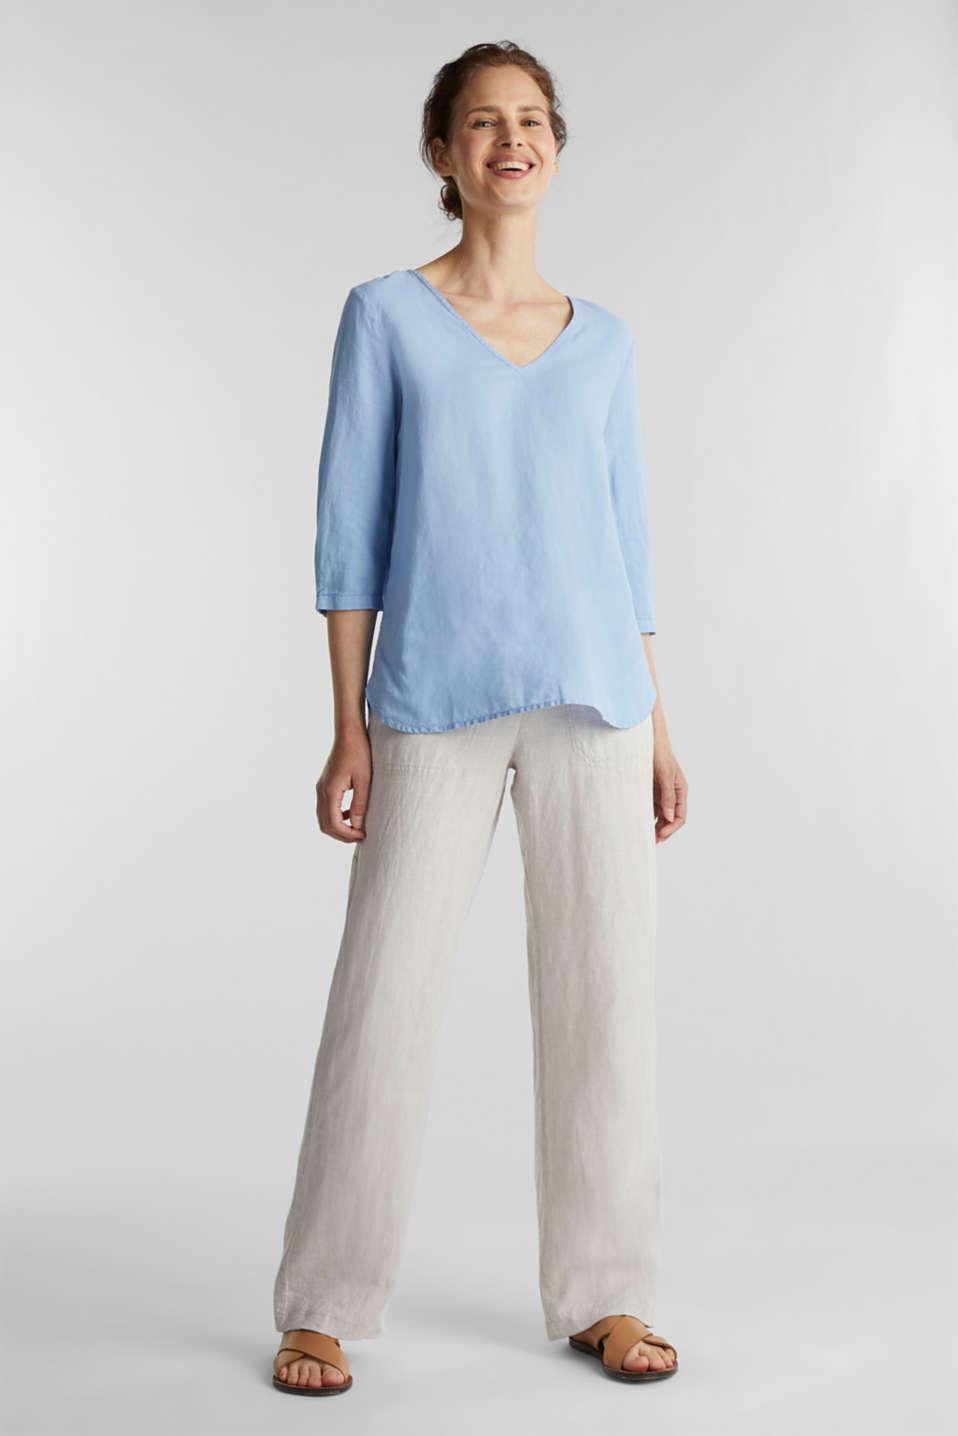 Blended linen blouse with 3/4-length sleeves, LIGHT BLUE, detail image number 1